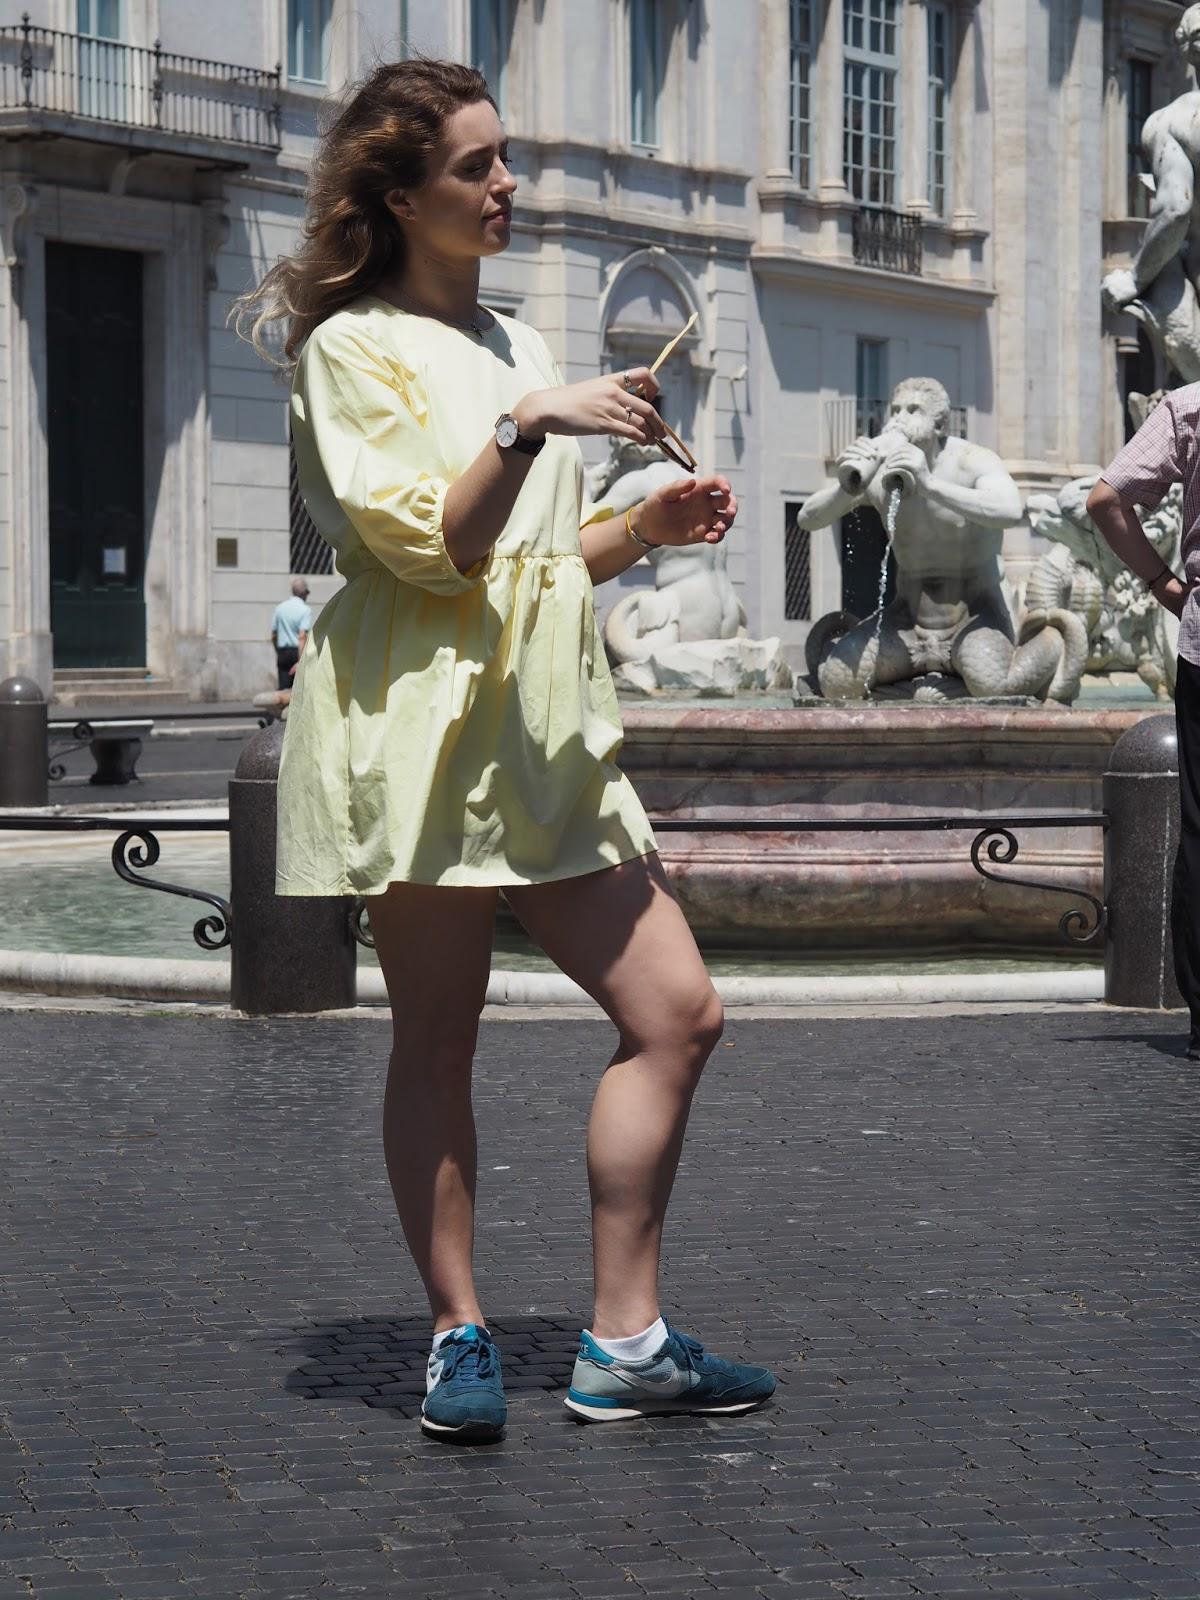 E.K.W. Girl in Yellow Dress